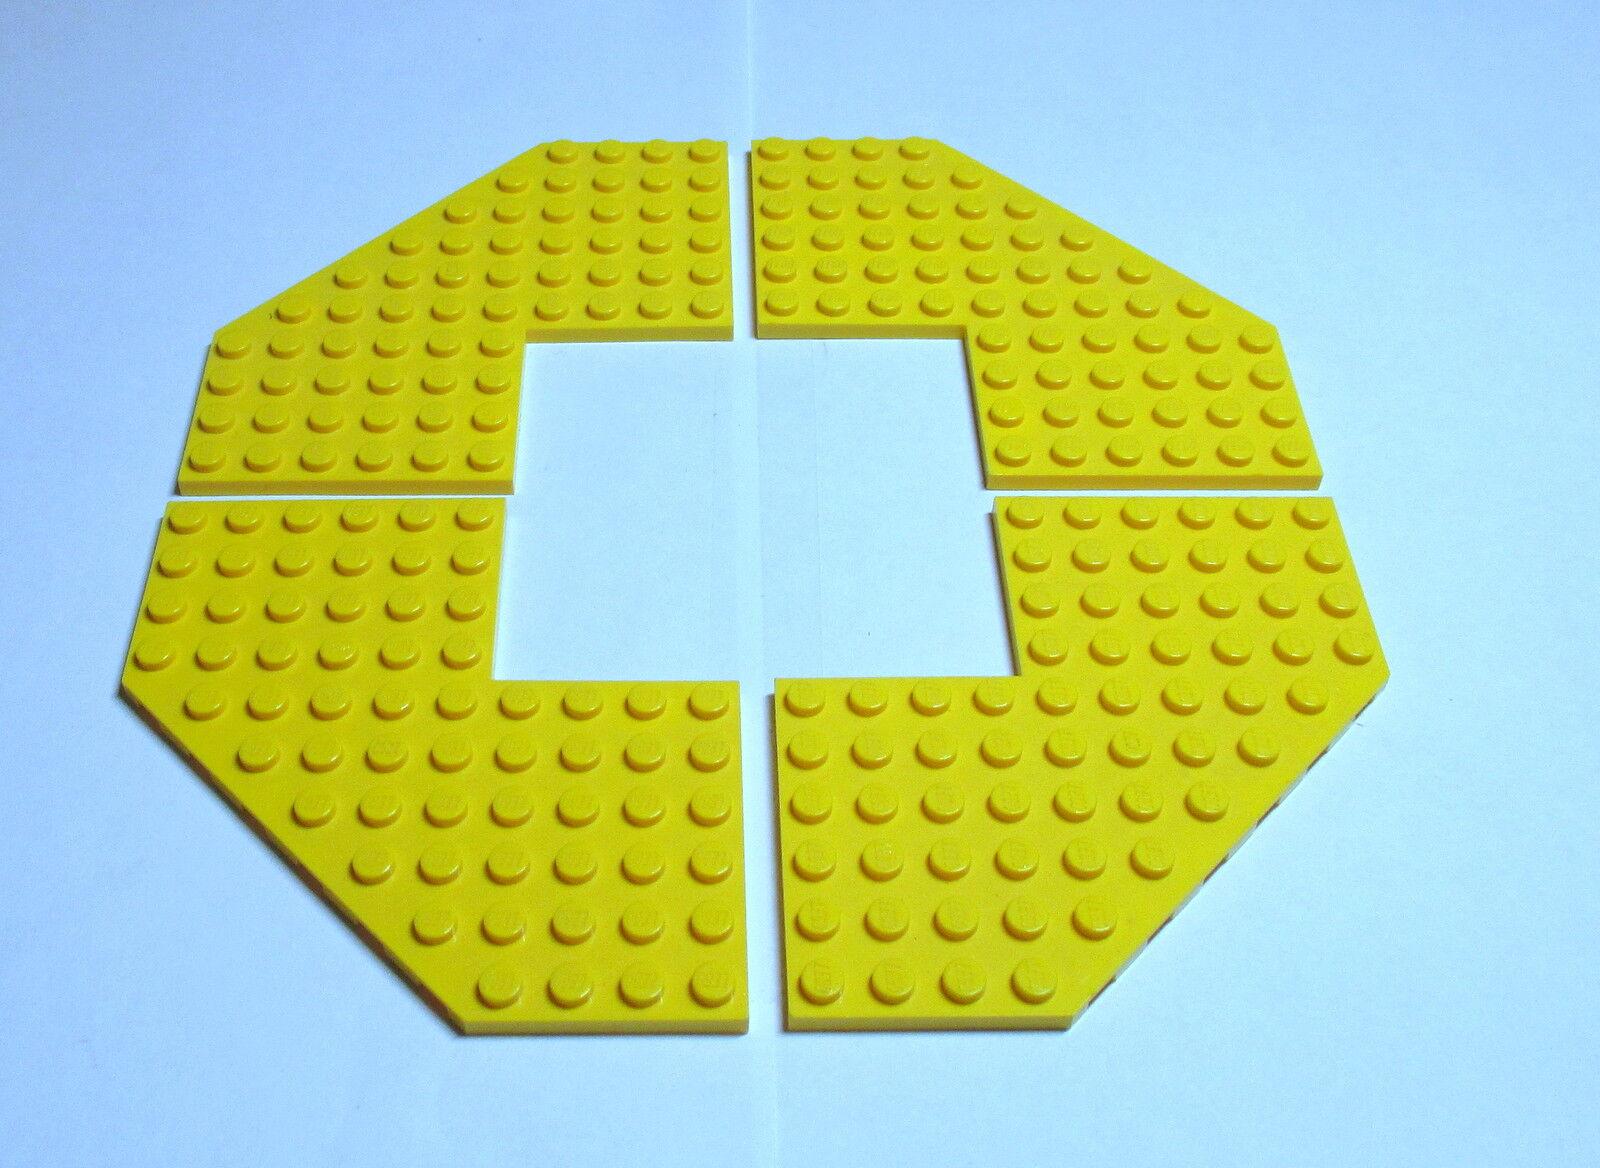 Lego 10 Stück runde Ecke Platte 4x4 beige tan 30565 Eckplatte Eckplatten Neu